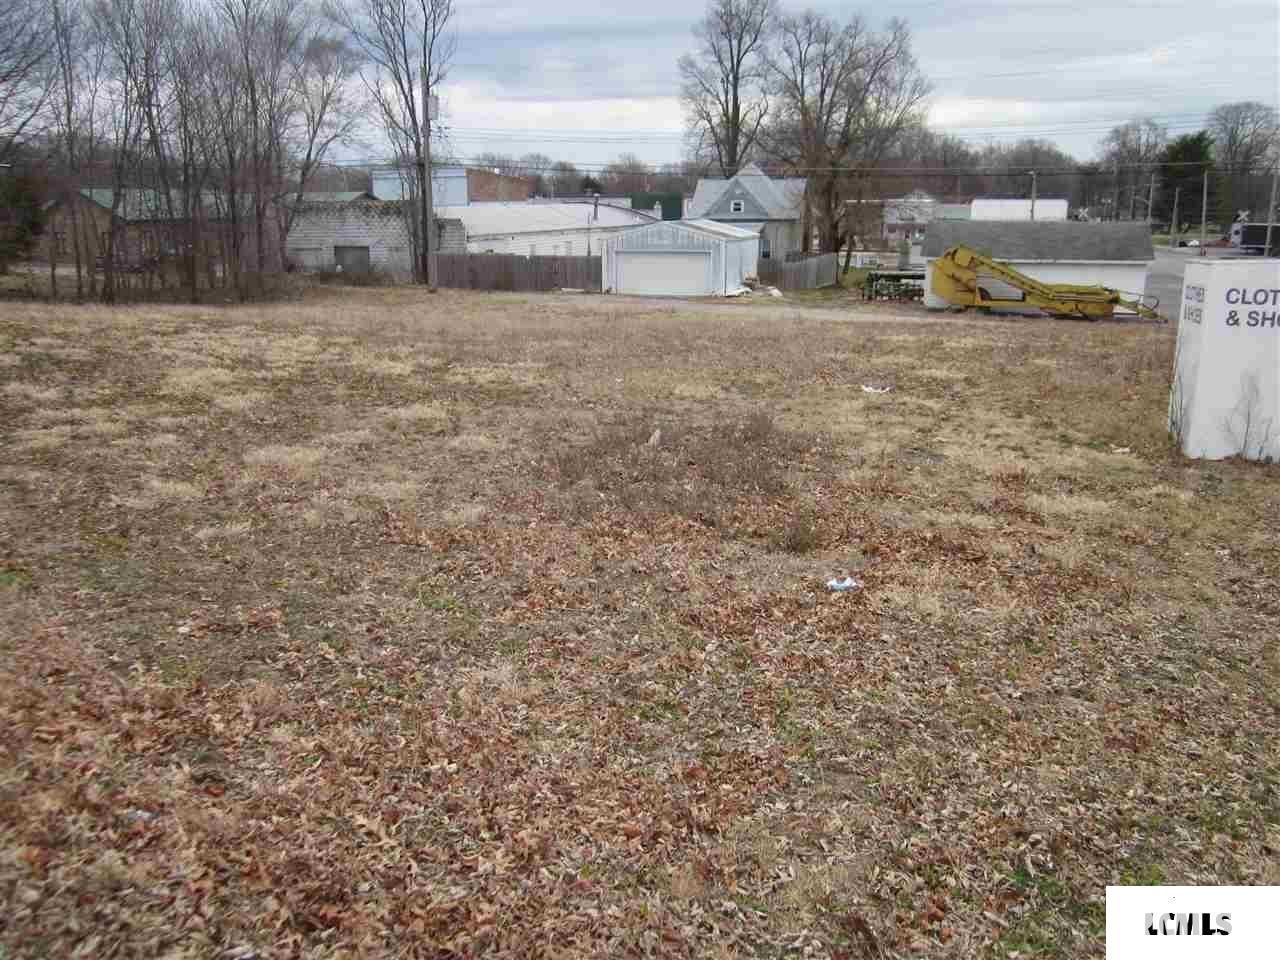 100 N ADAMS Property Photo - Manito, IL real estate listing